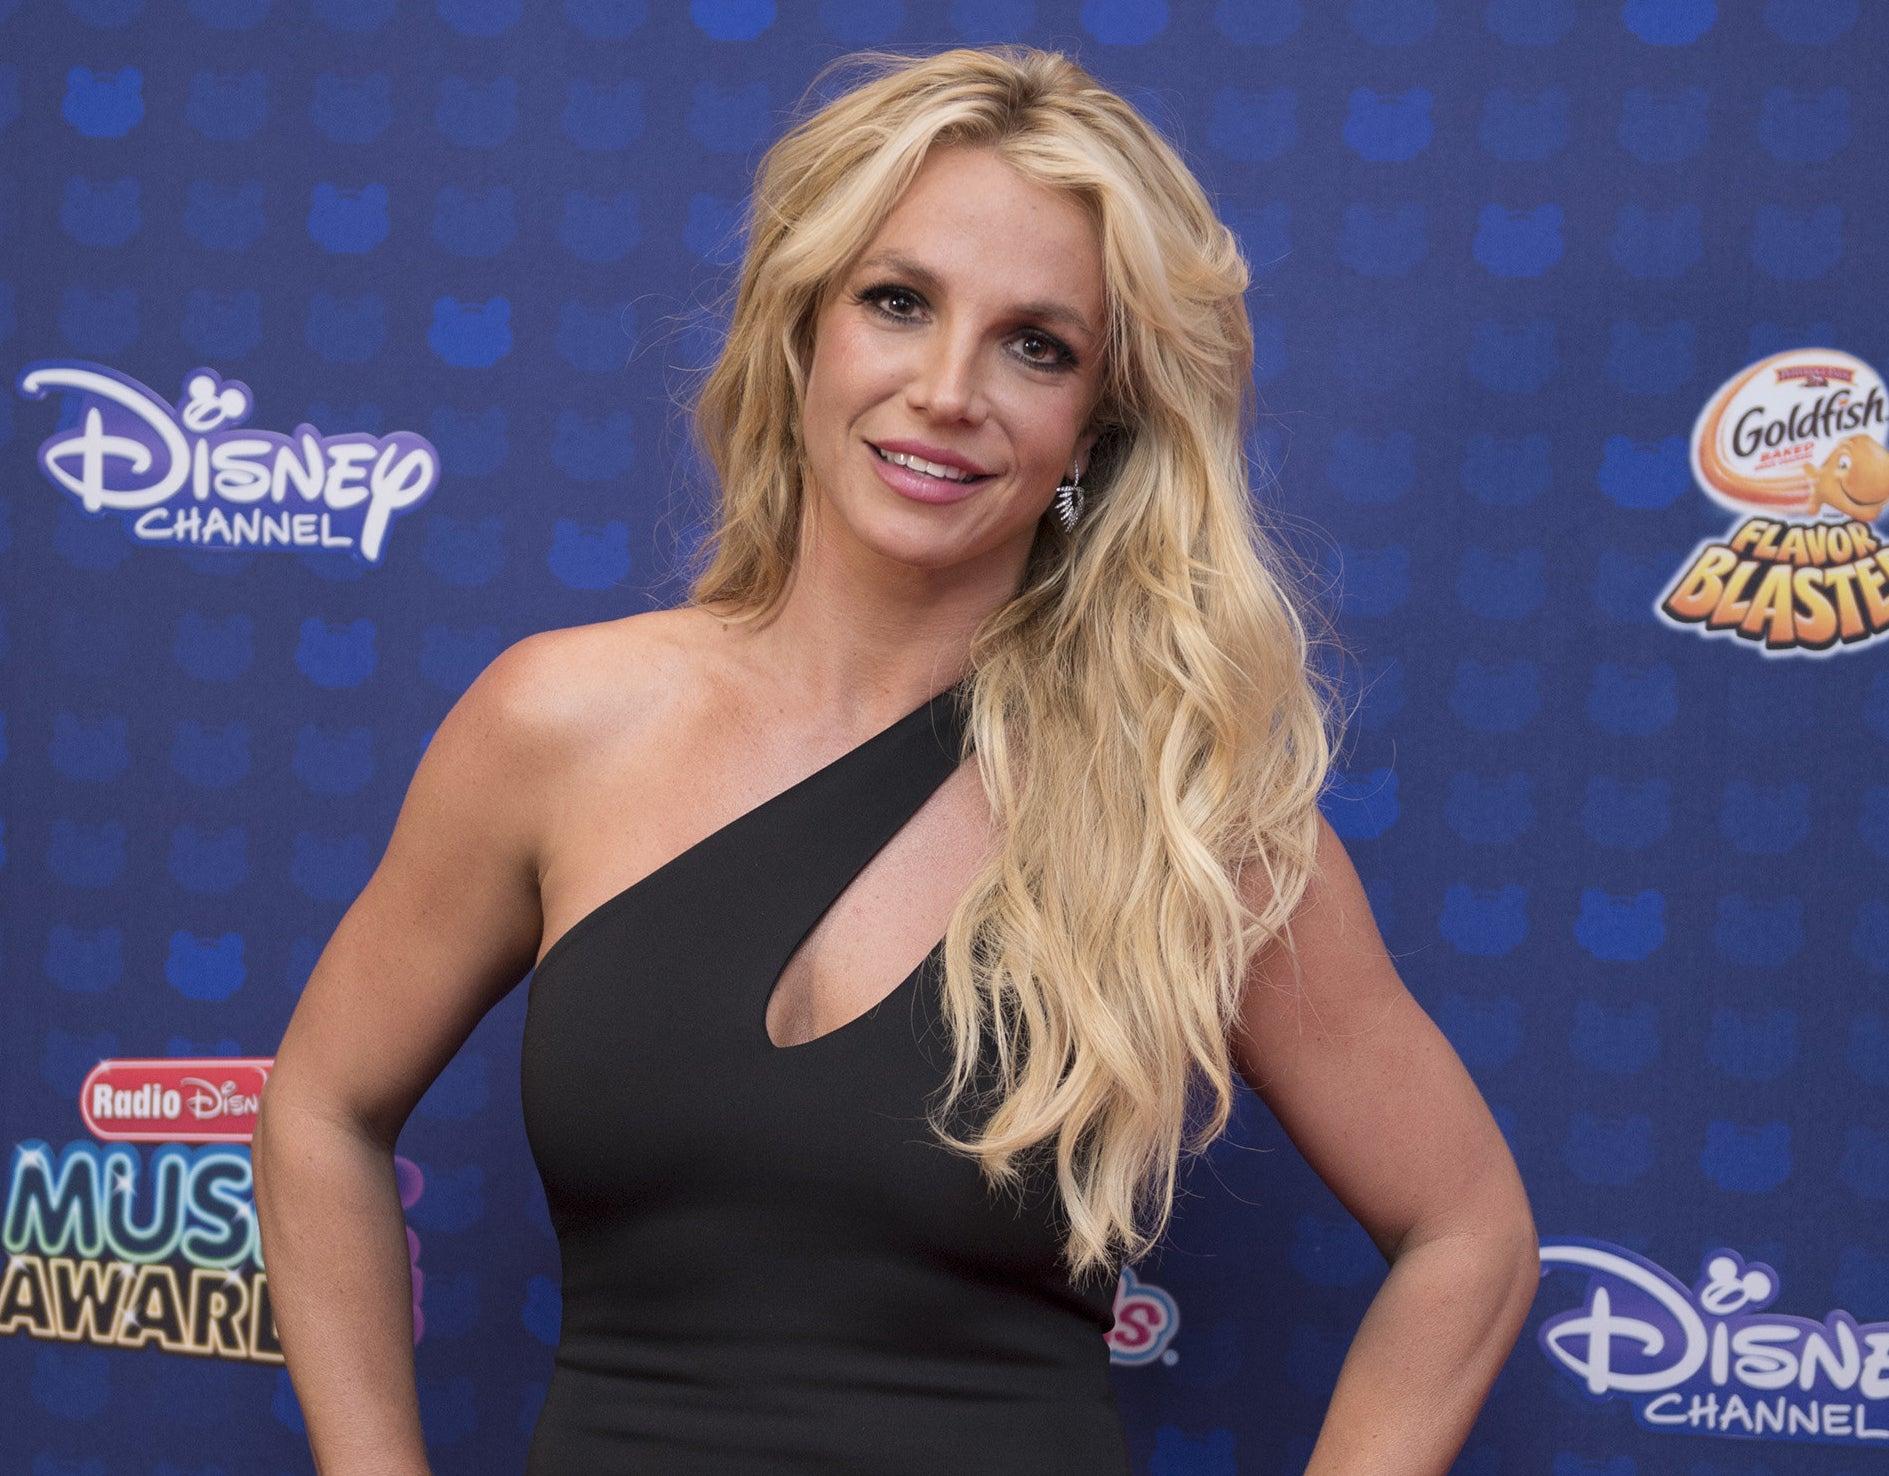 Britney puts both her hands on her hips in a black one-shoulder dress